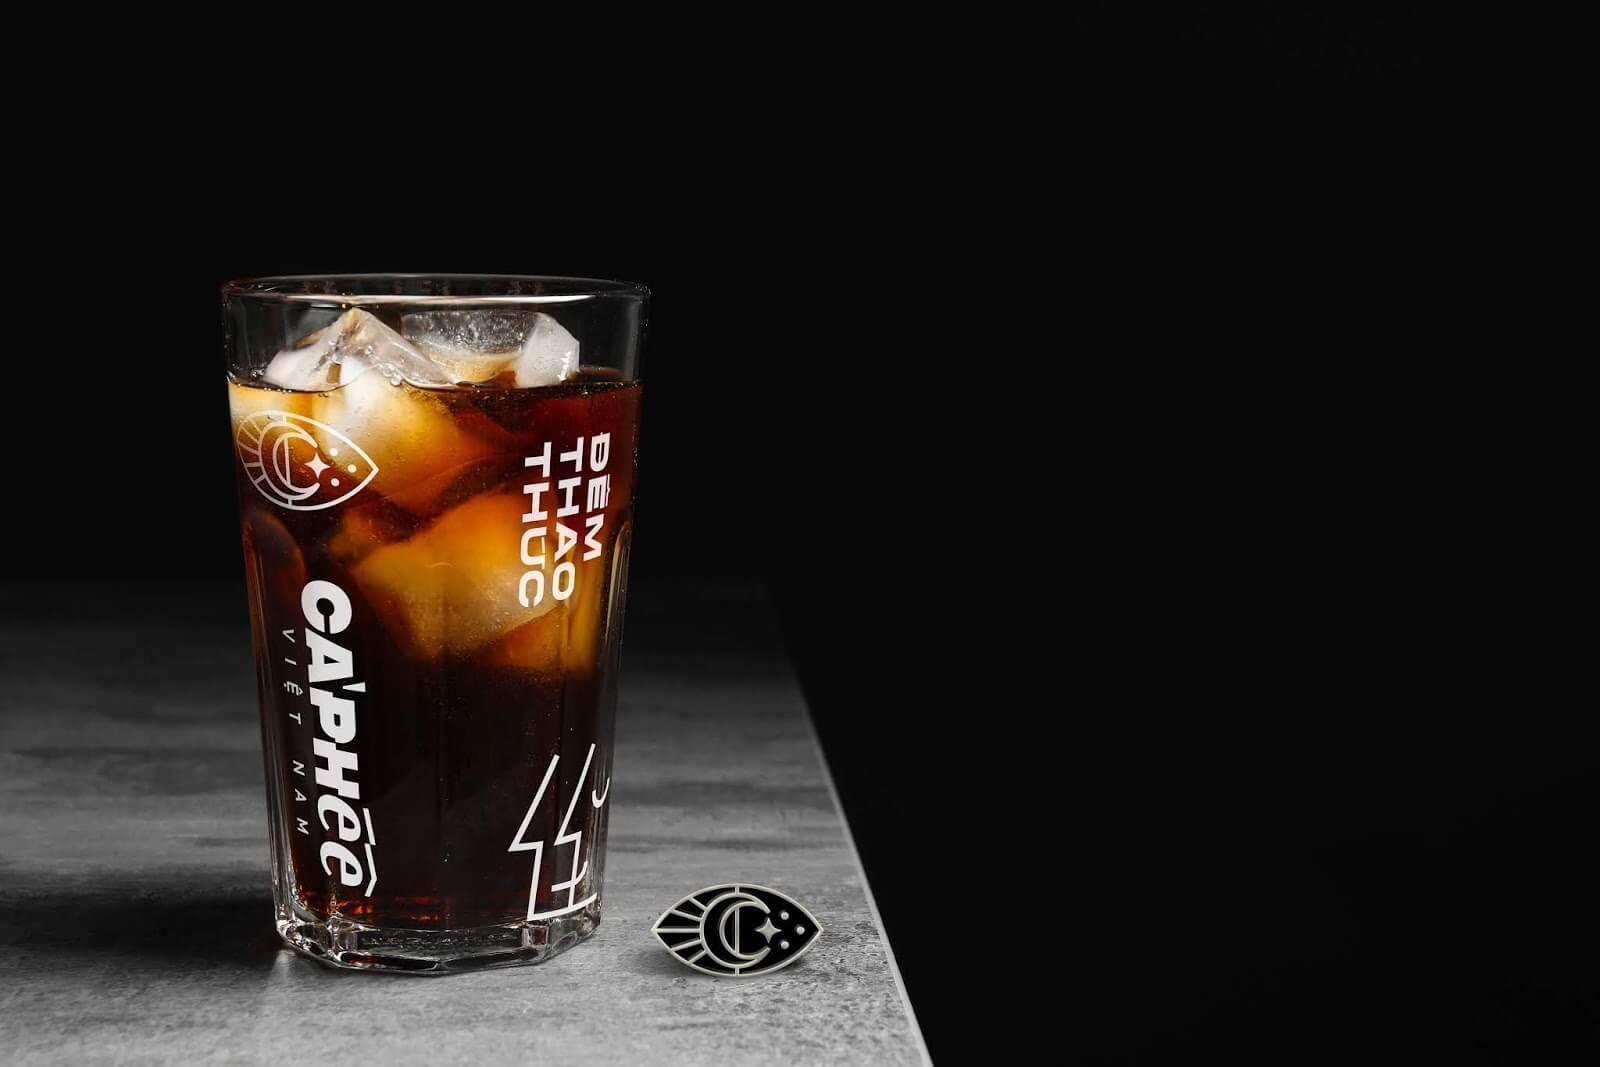 10 submit project tonbui 1 - Ach, tie obaly - Cà phê Việt Nam Vietnam Coffee